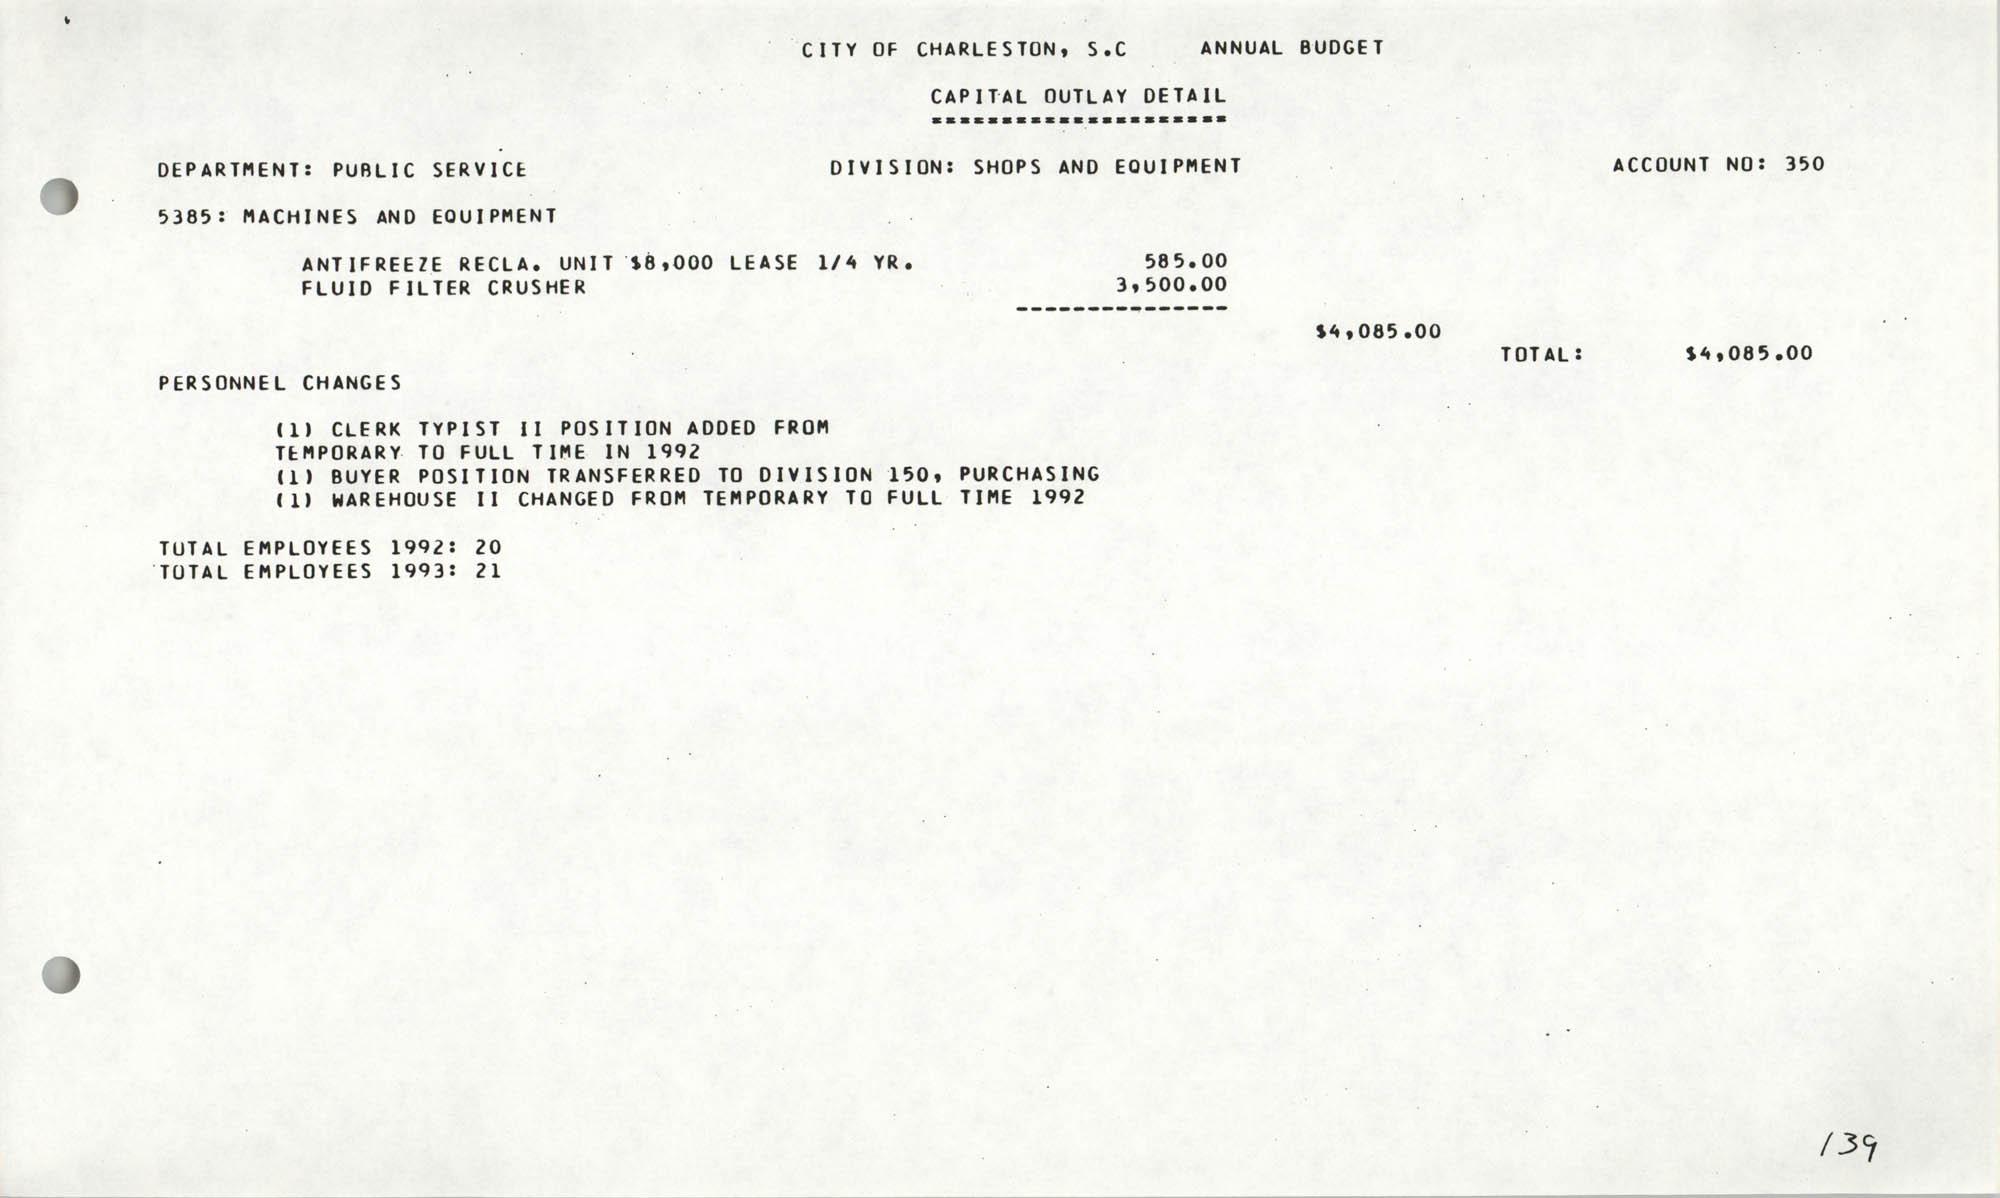 The City Council of Charleston, South Carolina, 1993 Budget, Page 139